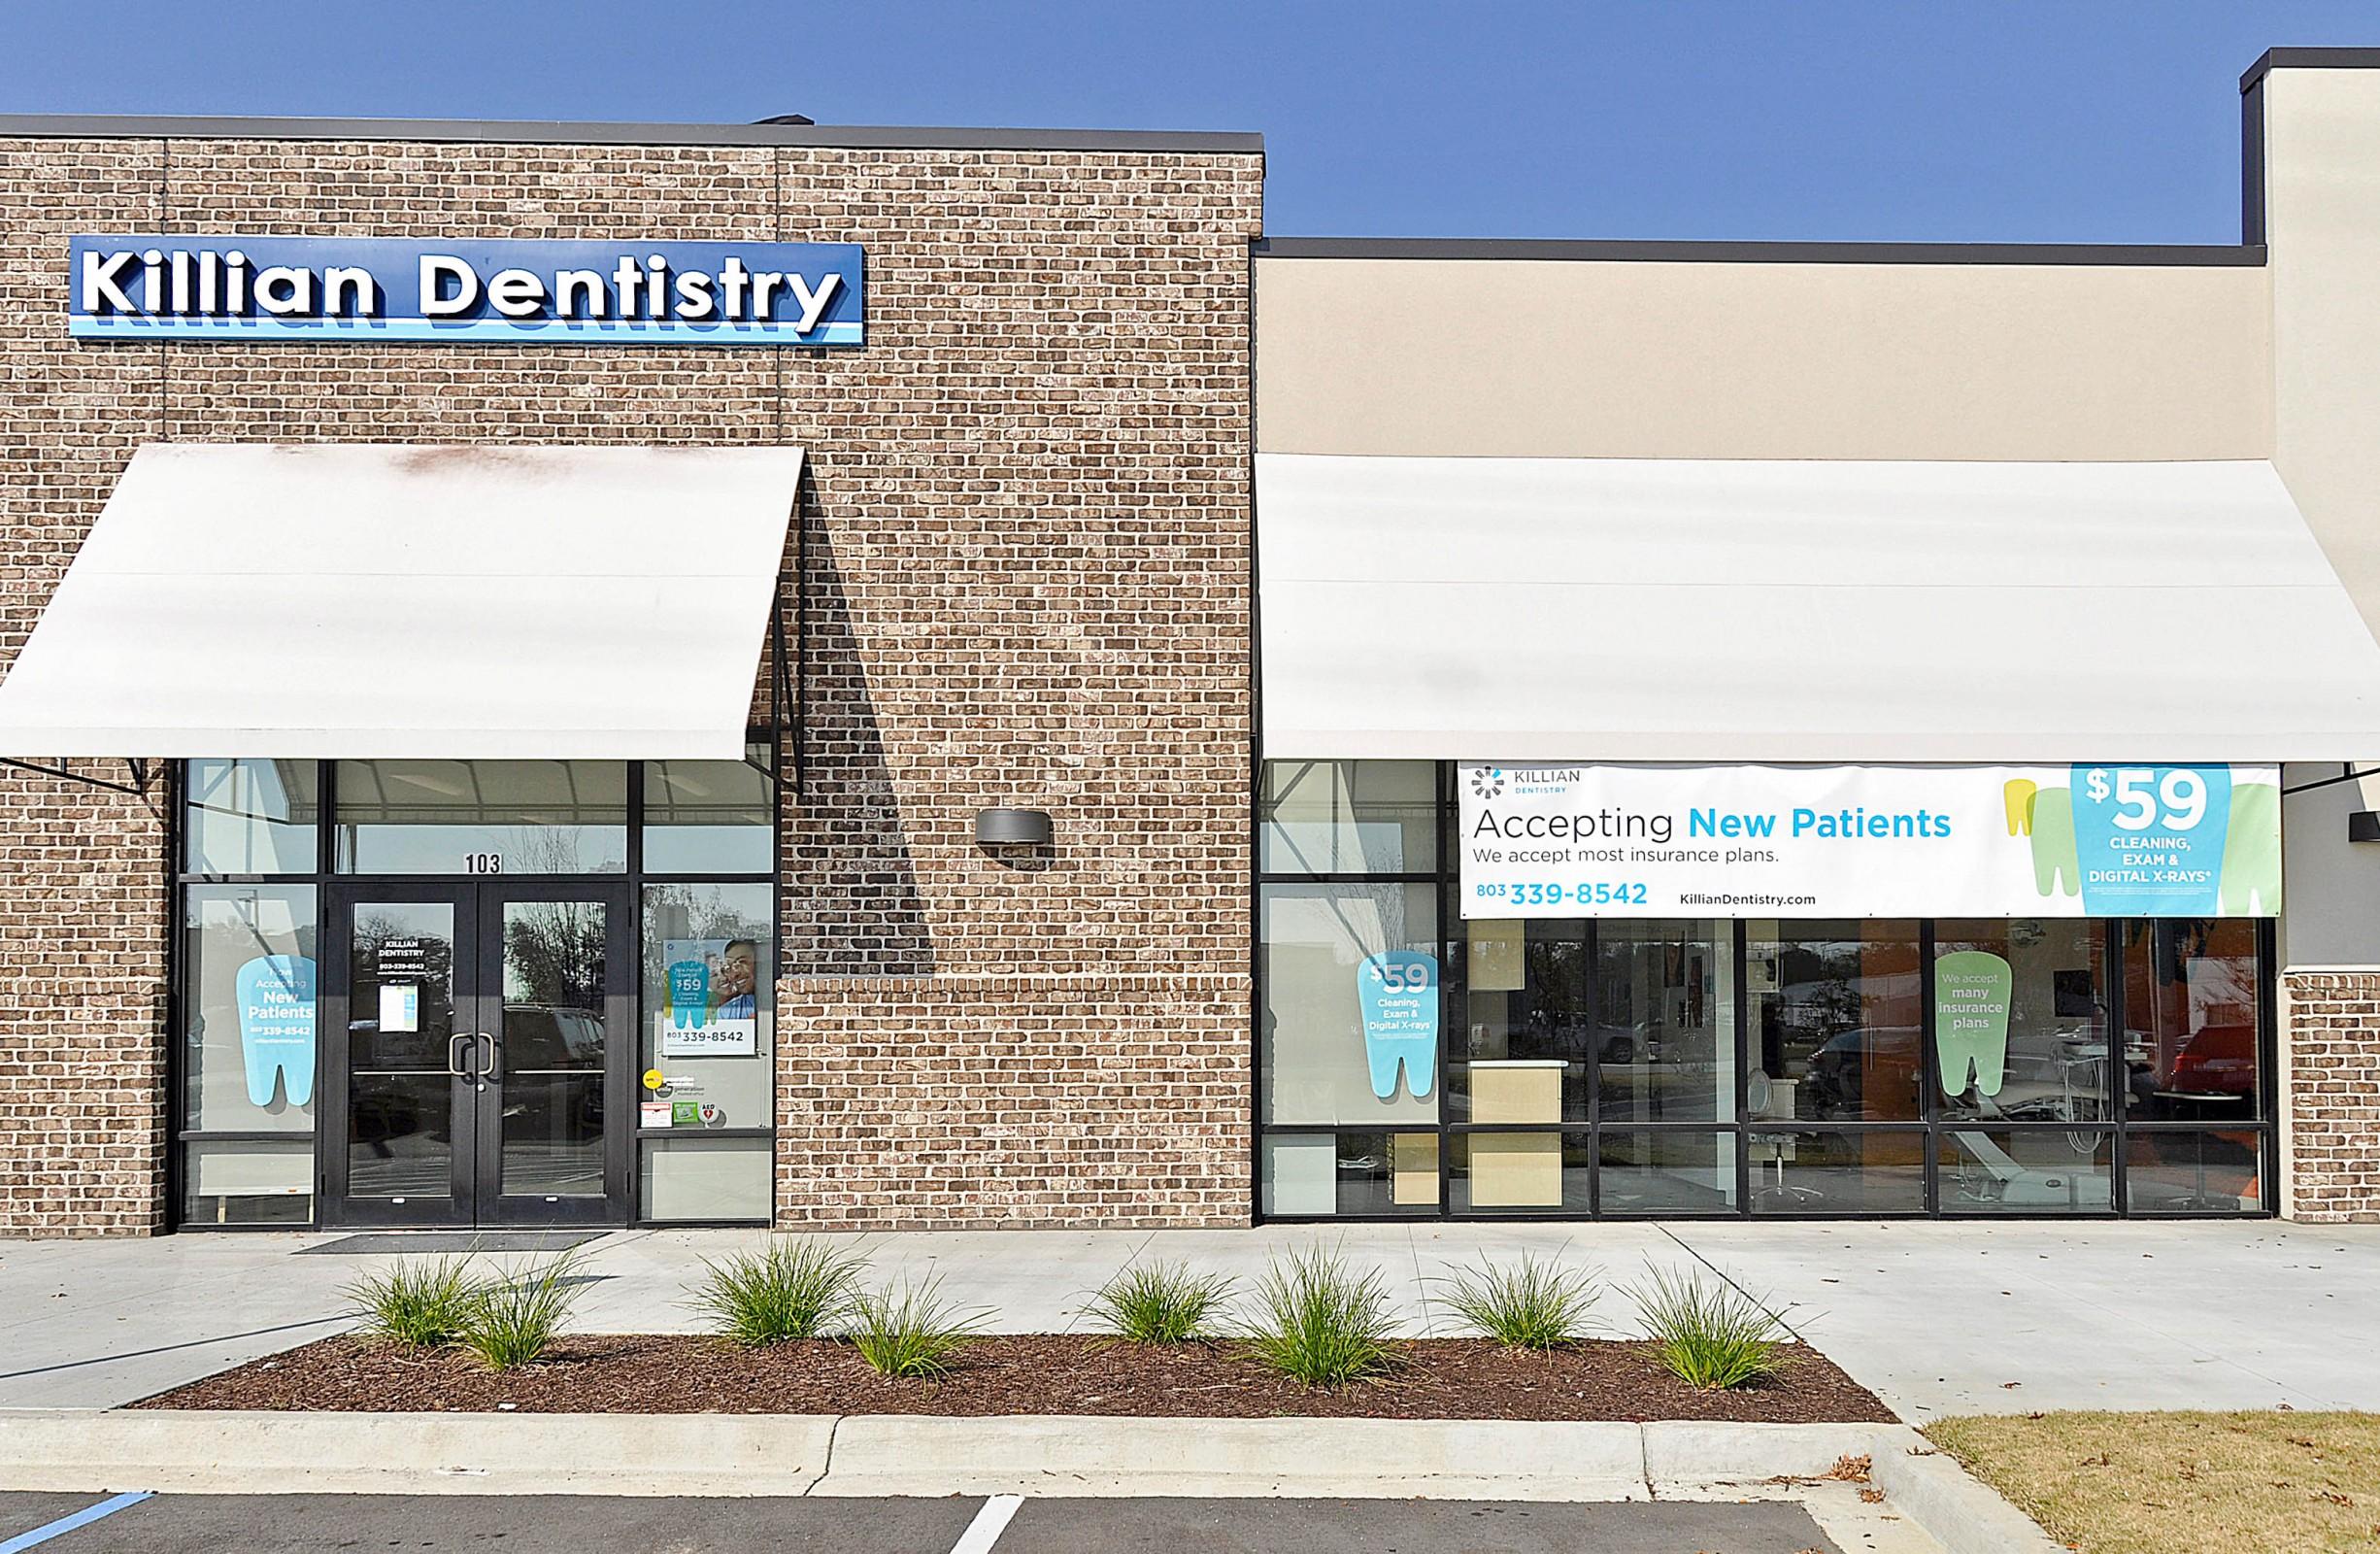 Killian Dentistry image 1